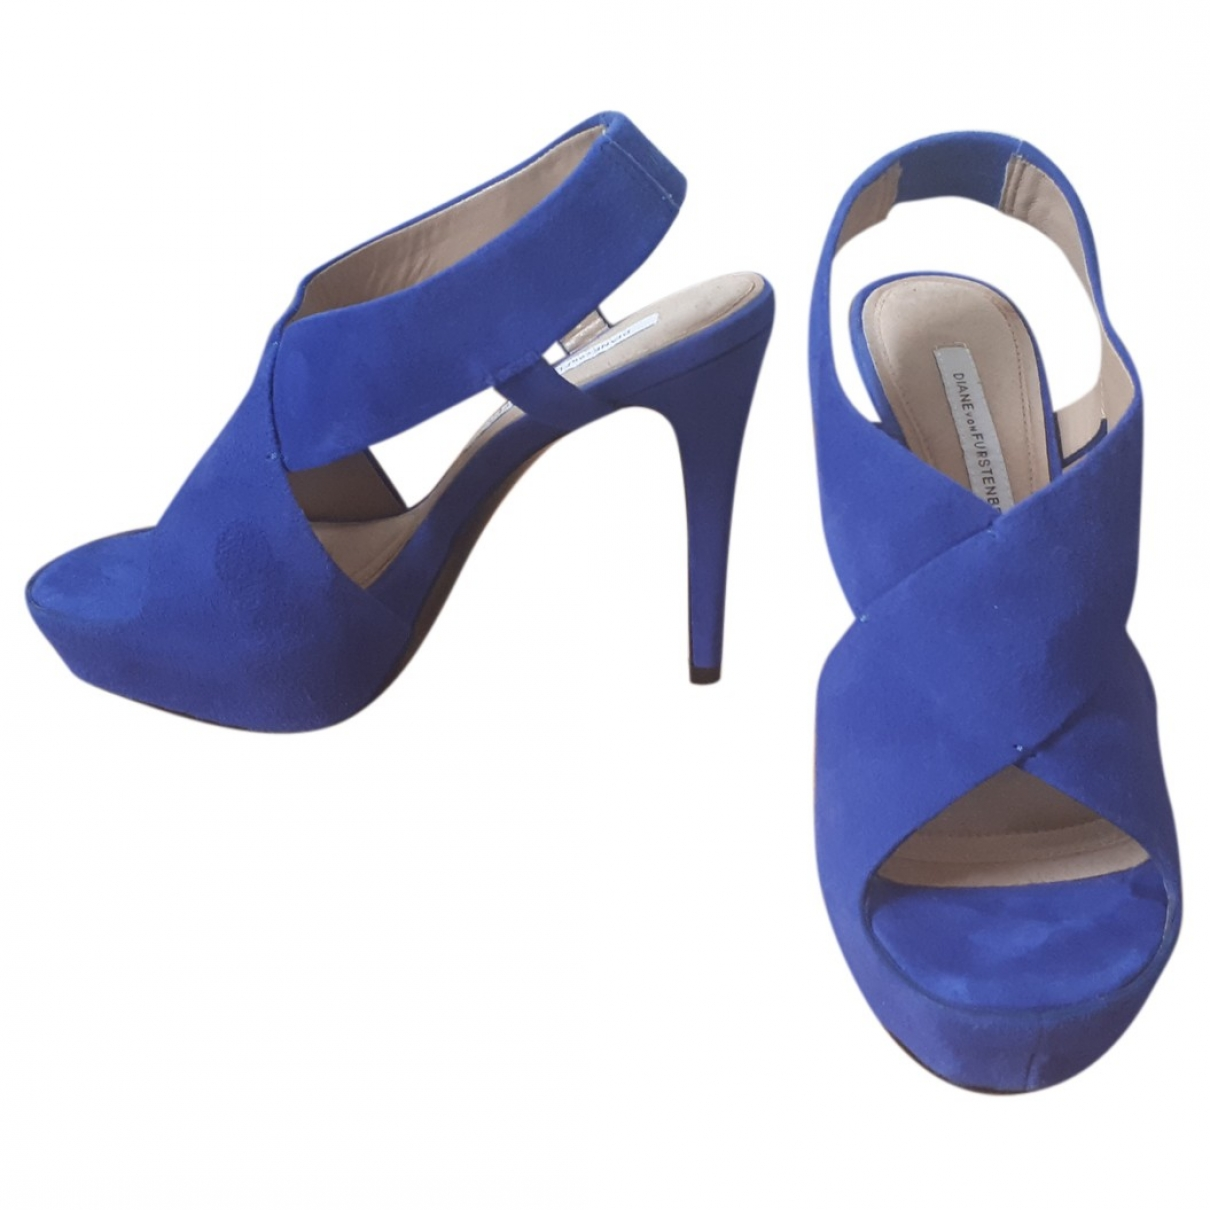 Diane Von Furstenberg - Sandales   pour femme en suede - bleu